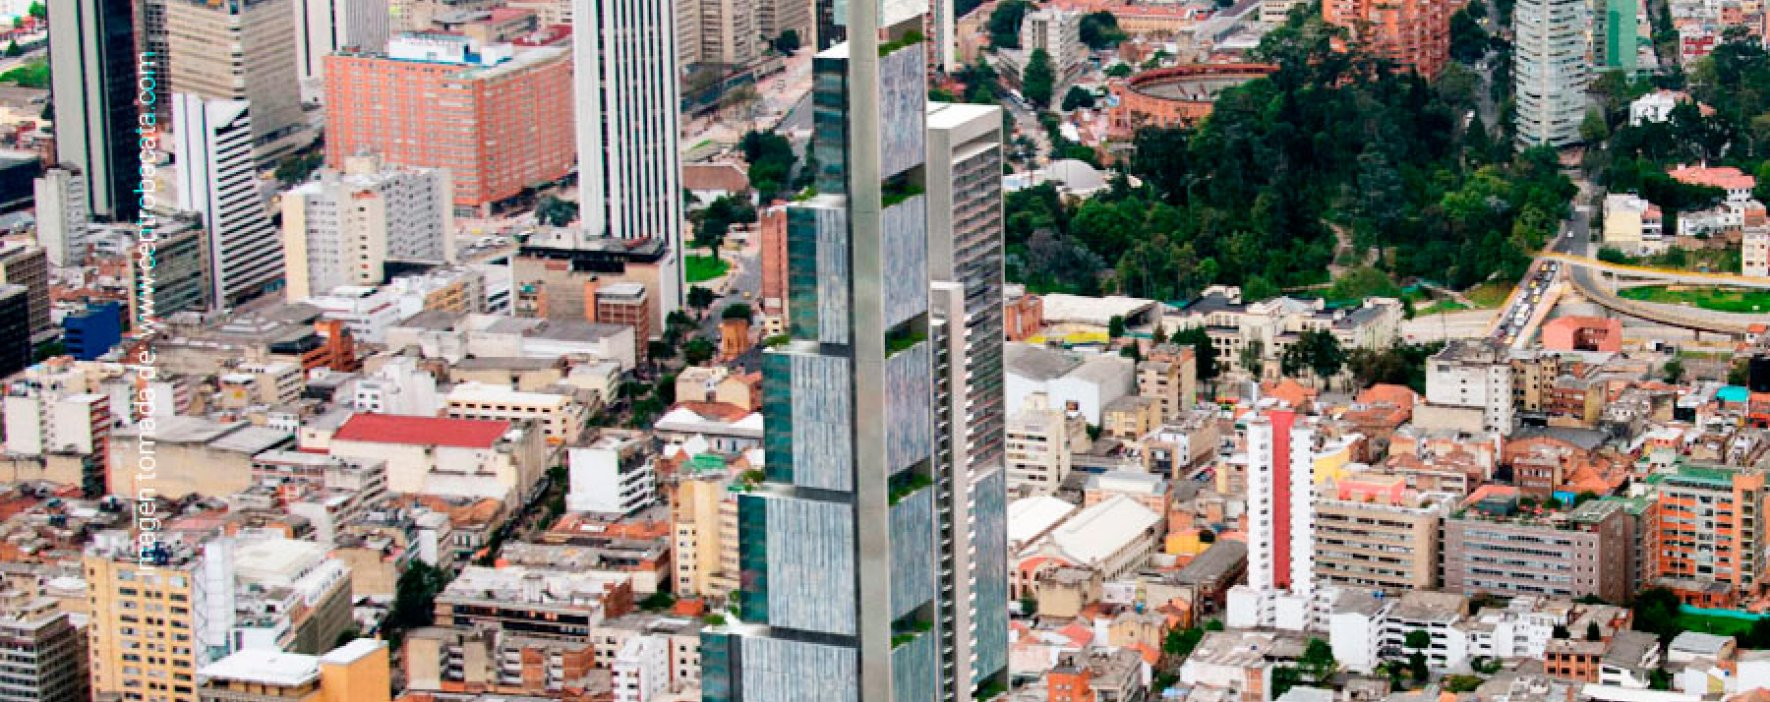 Importante valorización del centro de Bogotá